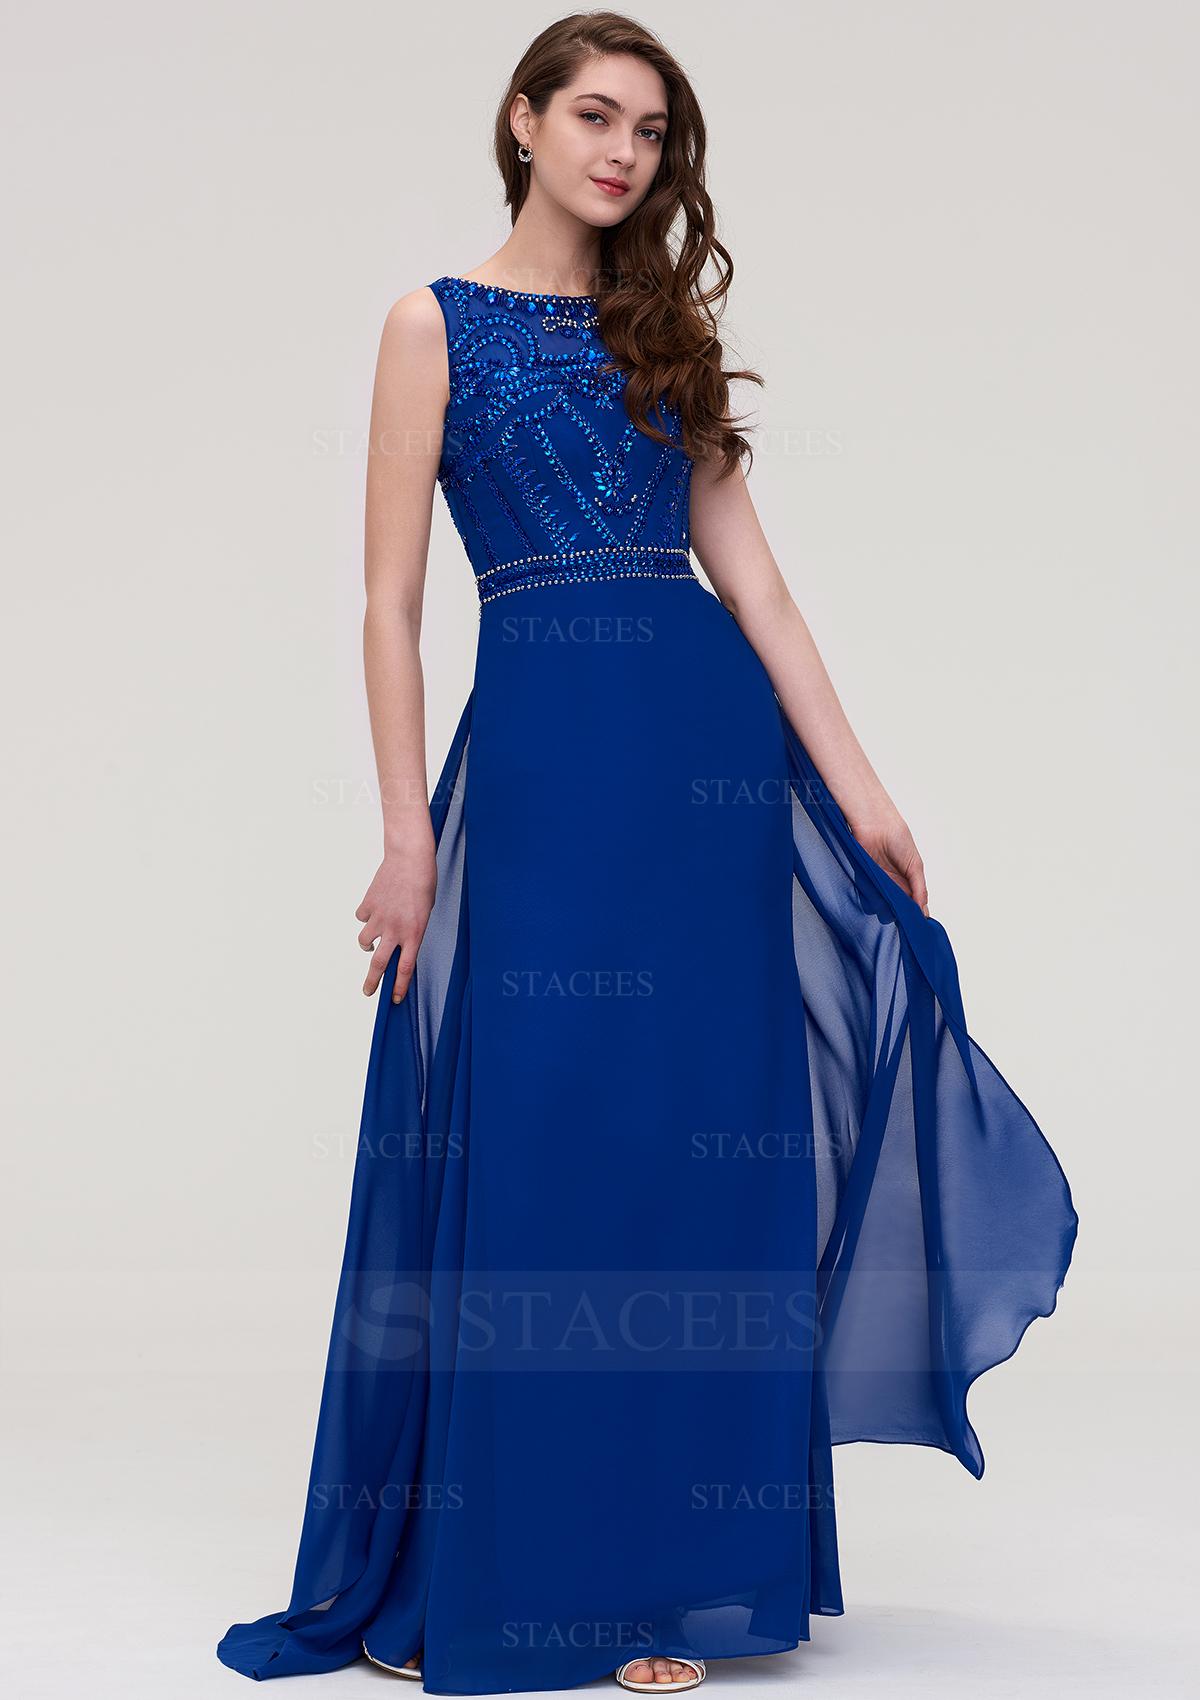 863e35df3b2d A-line/Princess Bateau Sleeveless Long/Floor-Length Chiffon Prom ...